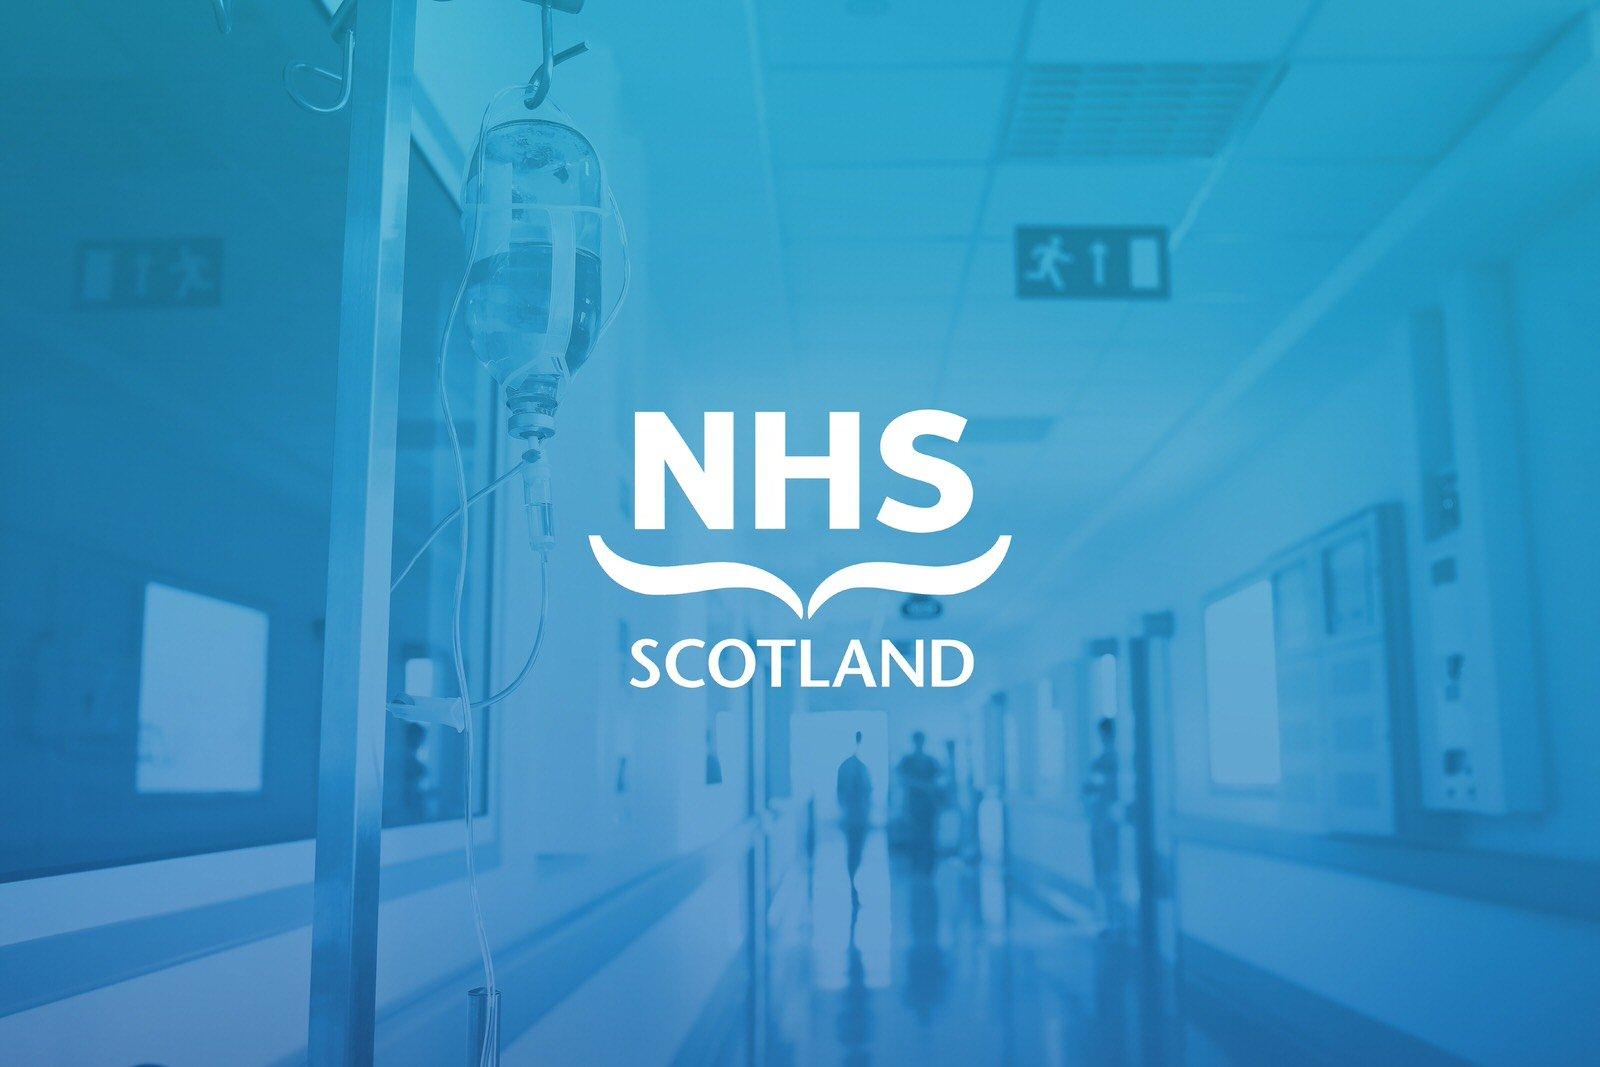 NHS-squashed